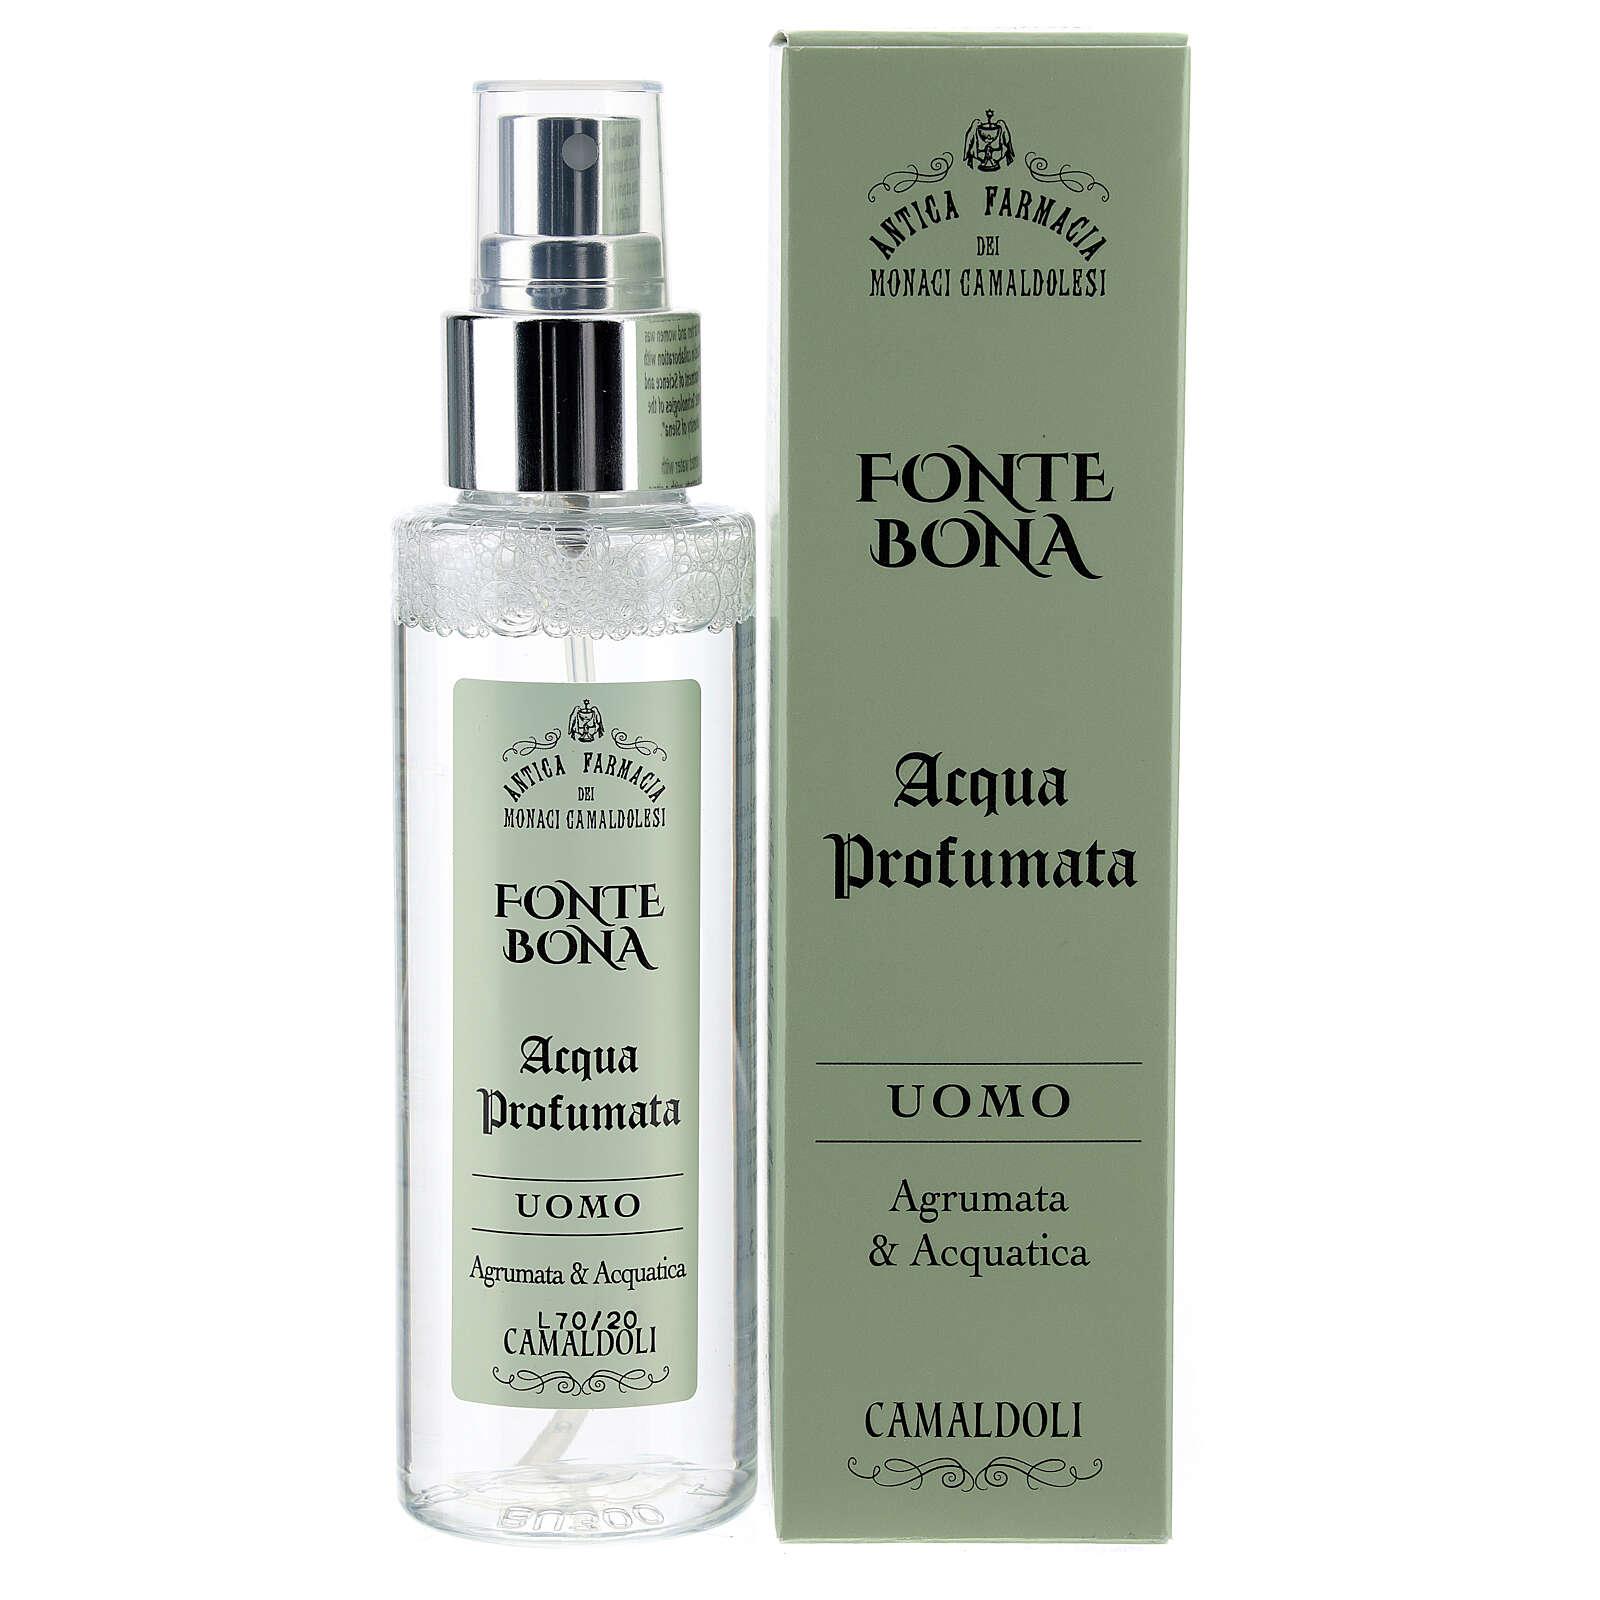 Eau parfumée homme agrumes Camaldoli 100 ml 4